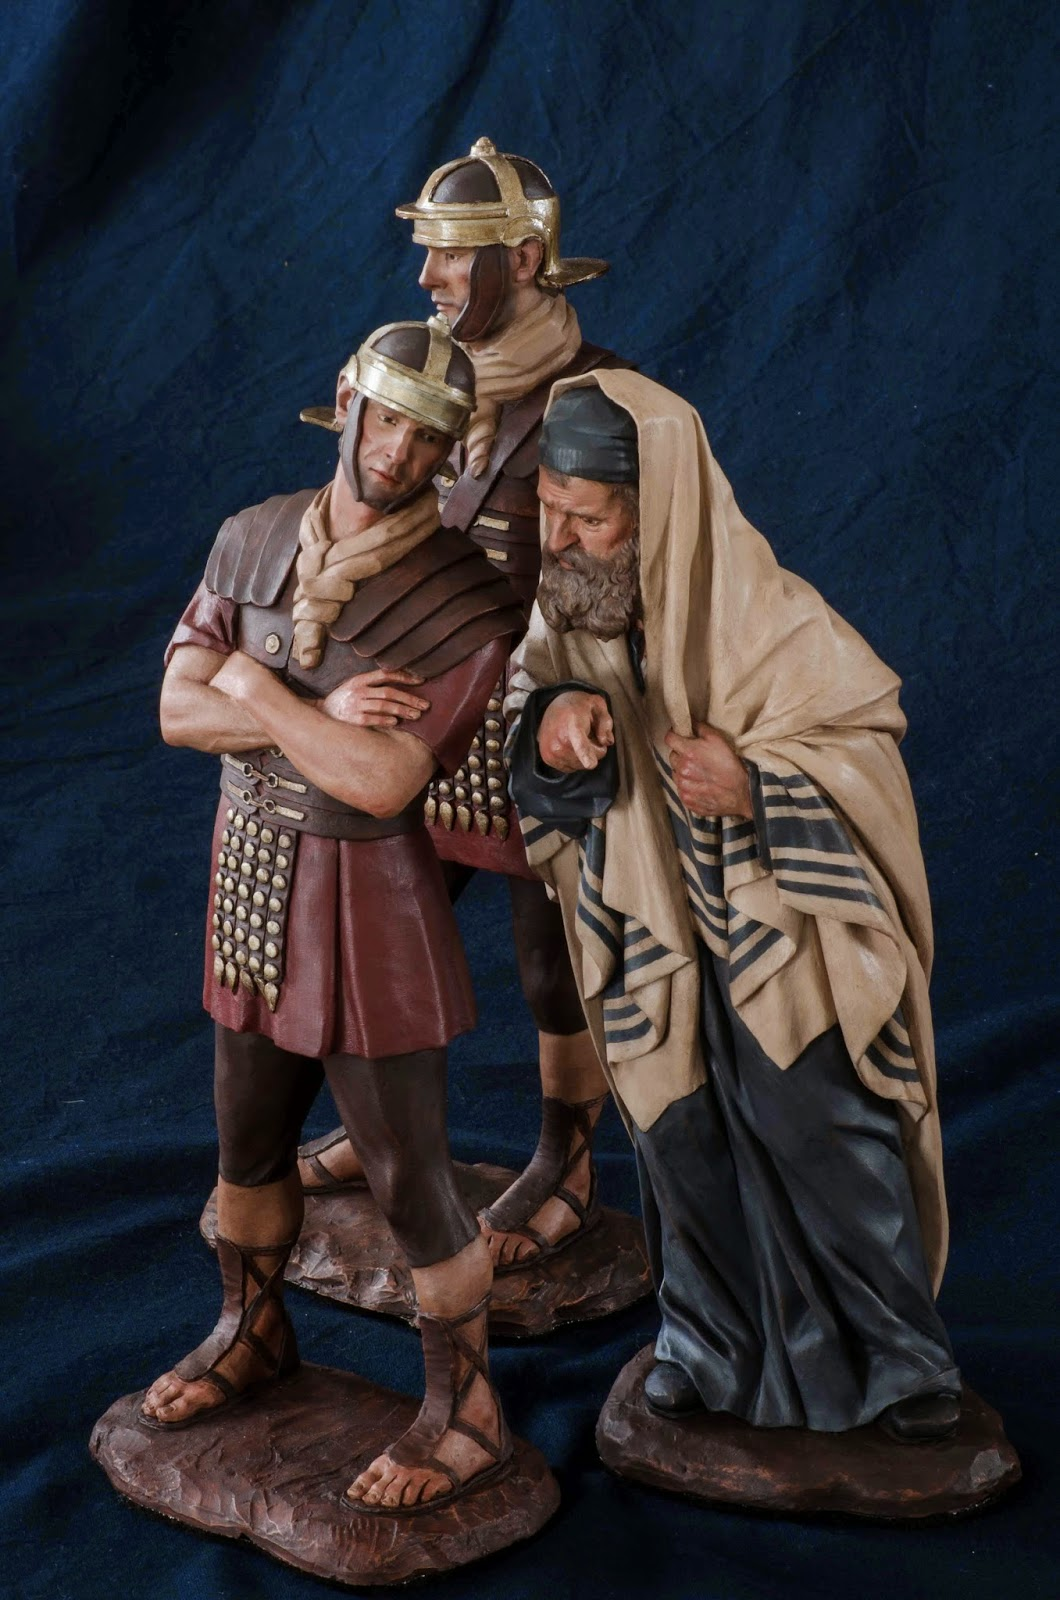 Belén presepe nativity krippe Arturo Serra escultura barro cocido 3